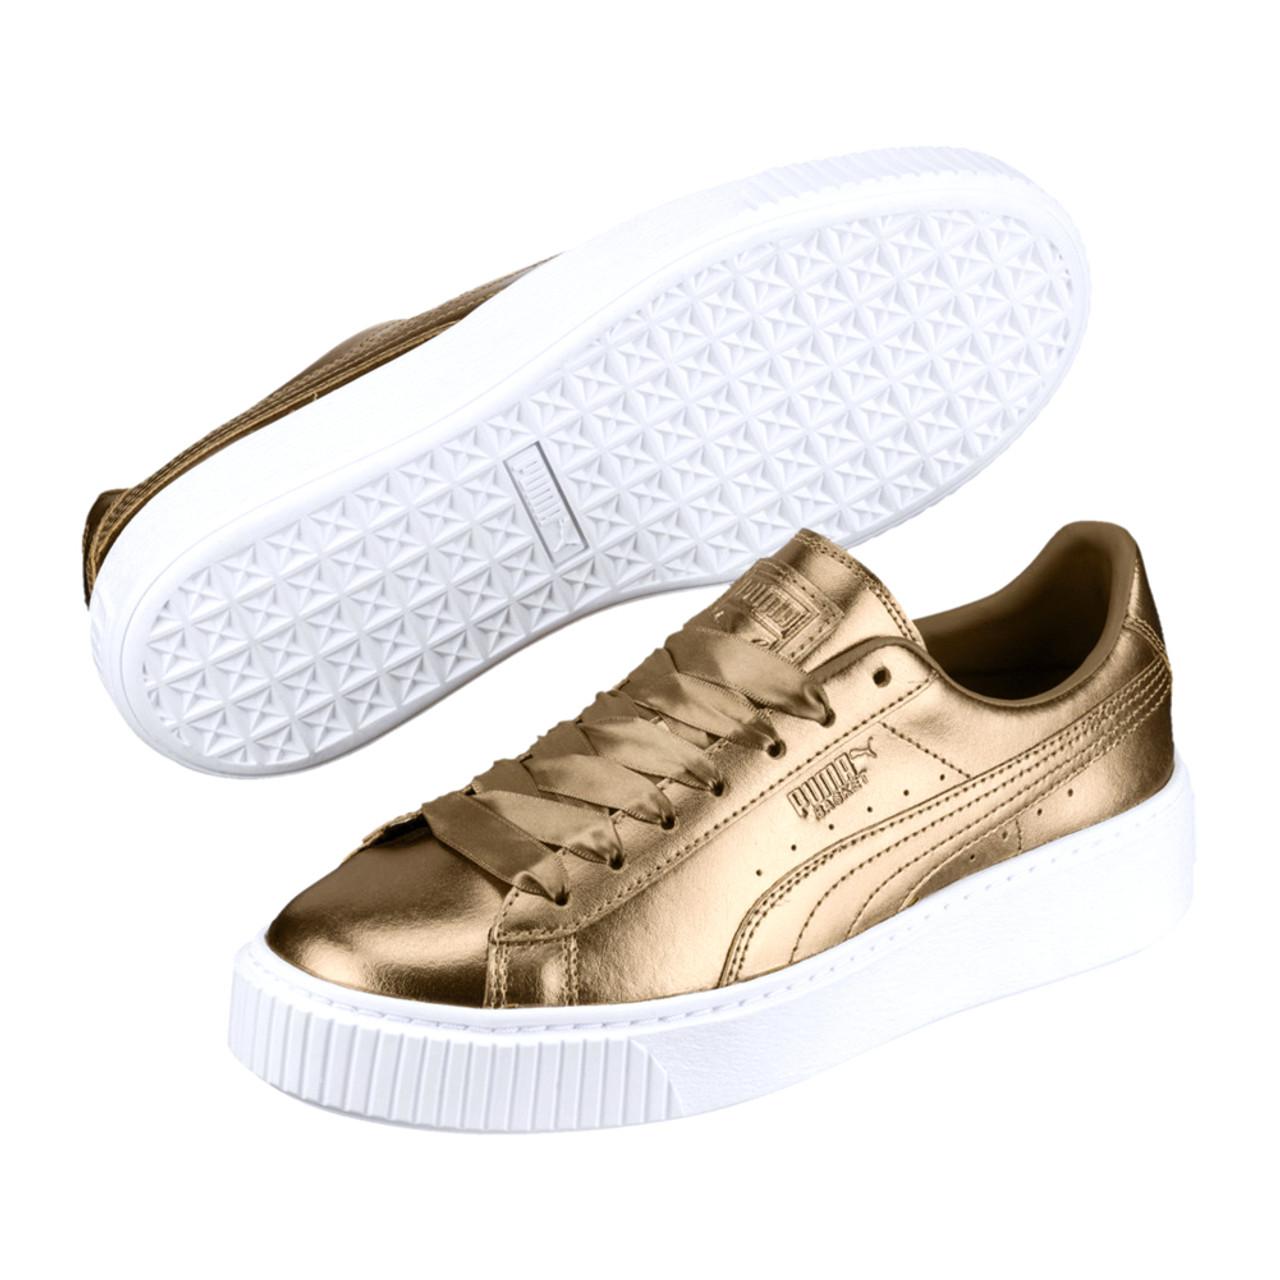 199522bd797 Puma Women s Basket Platform Luxe Sneakers Ermine - Shop now   Shoolu.com